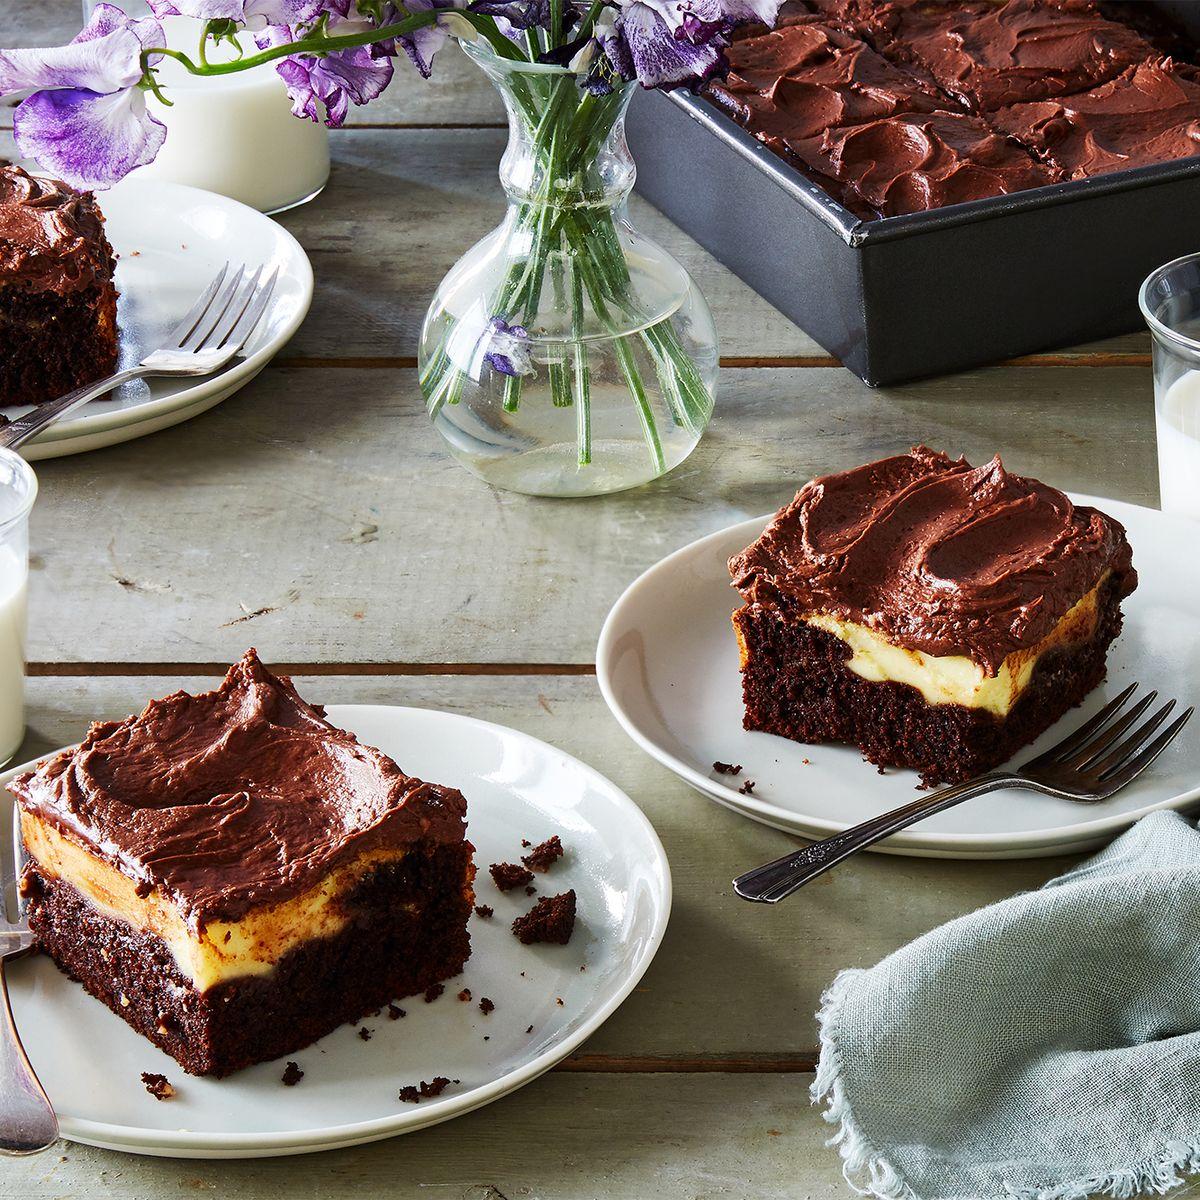 The Fudgy Swirly Chocolate Cream Cheese Cake My Mom Has Loved Since 1965